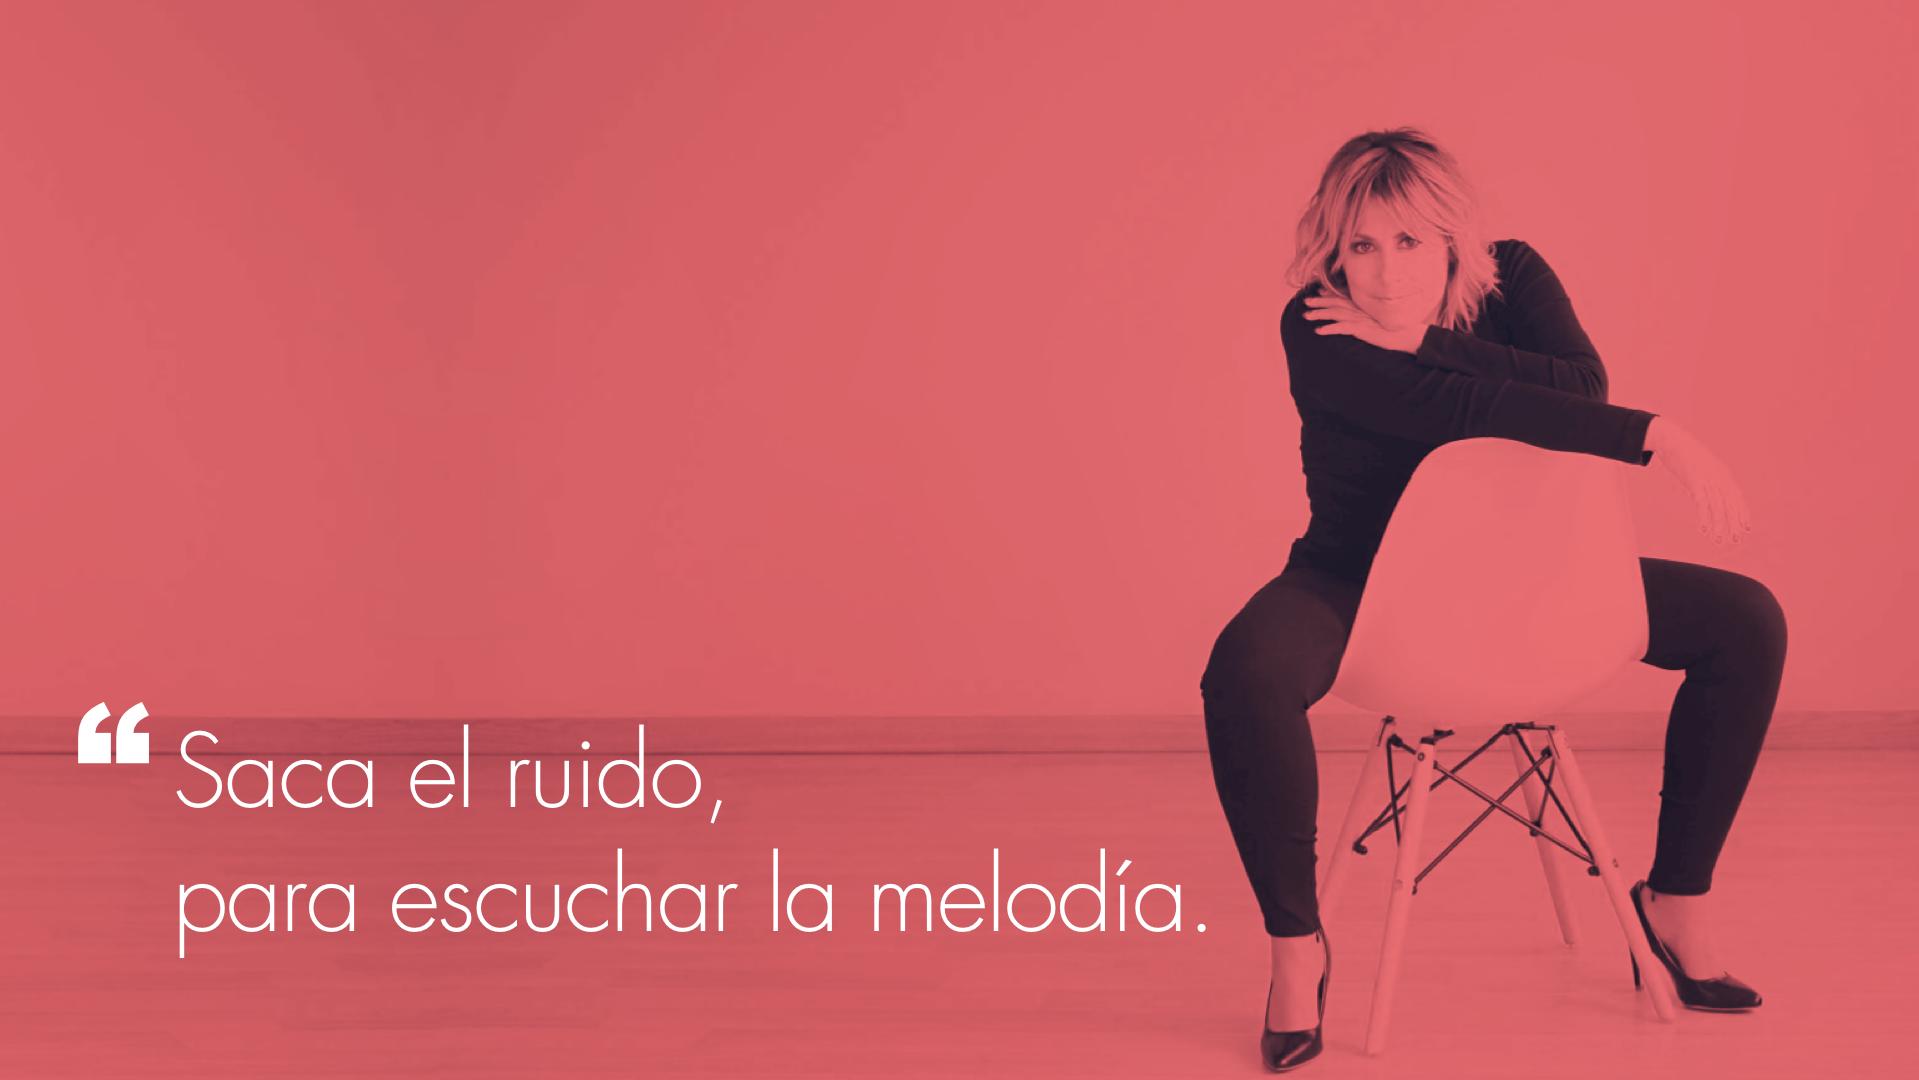 Marian Alonso - Experta en Liderazgo Femenino